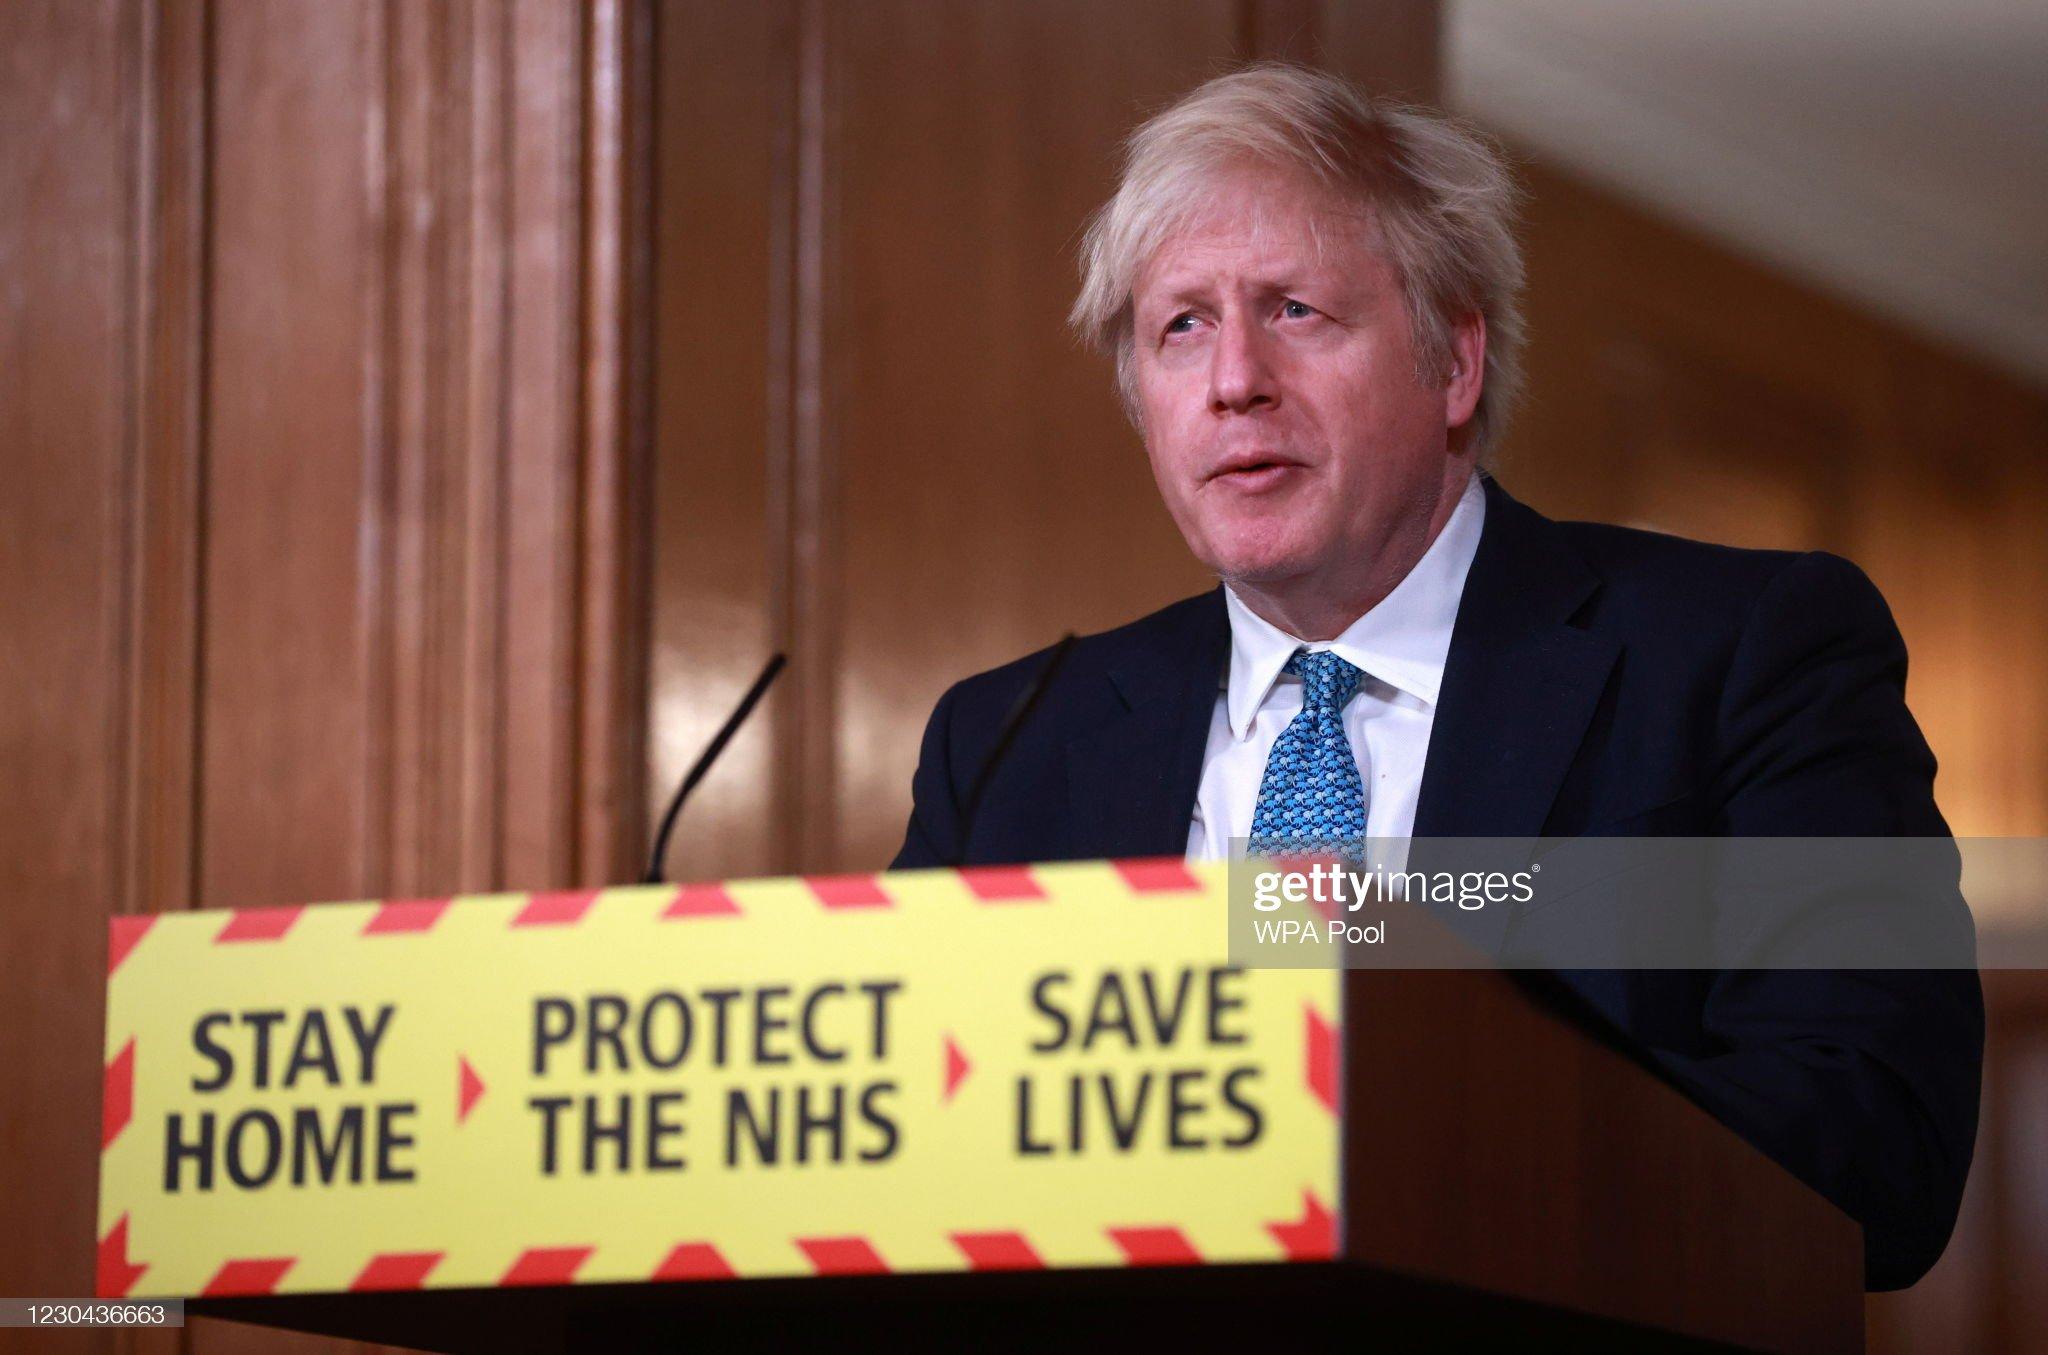 Boris Johnson Holds Press Conference On The Third National Coronavirus Lockdown : News Photo